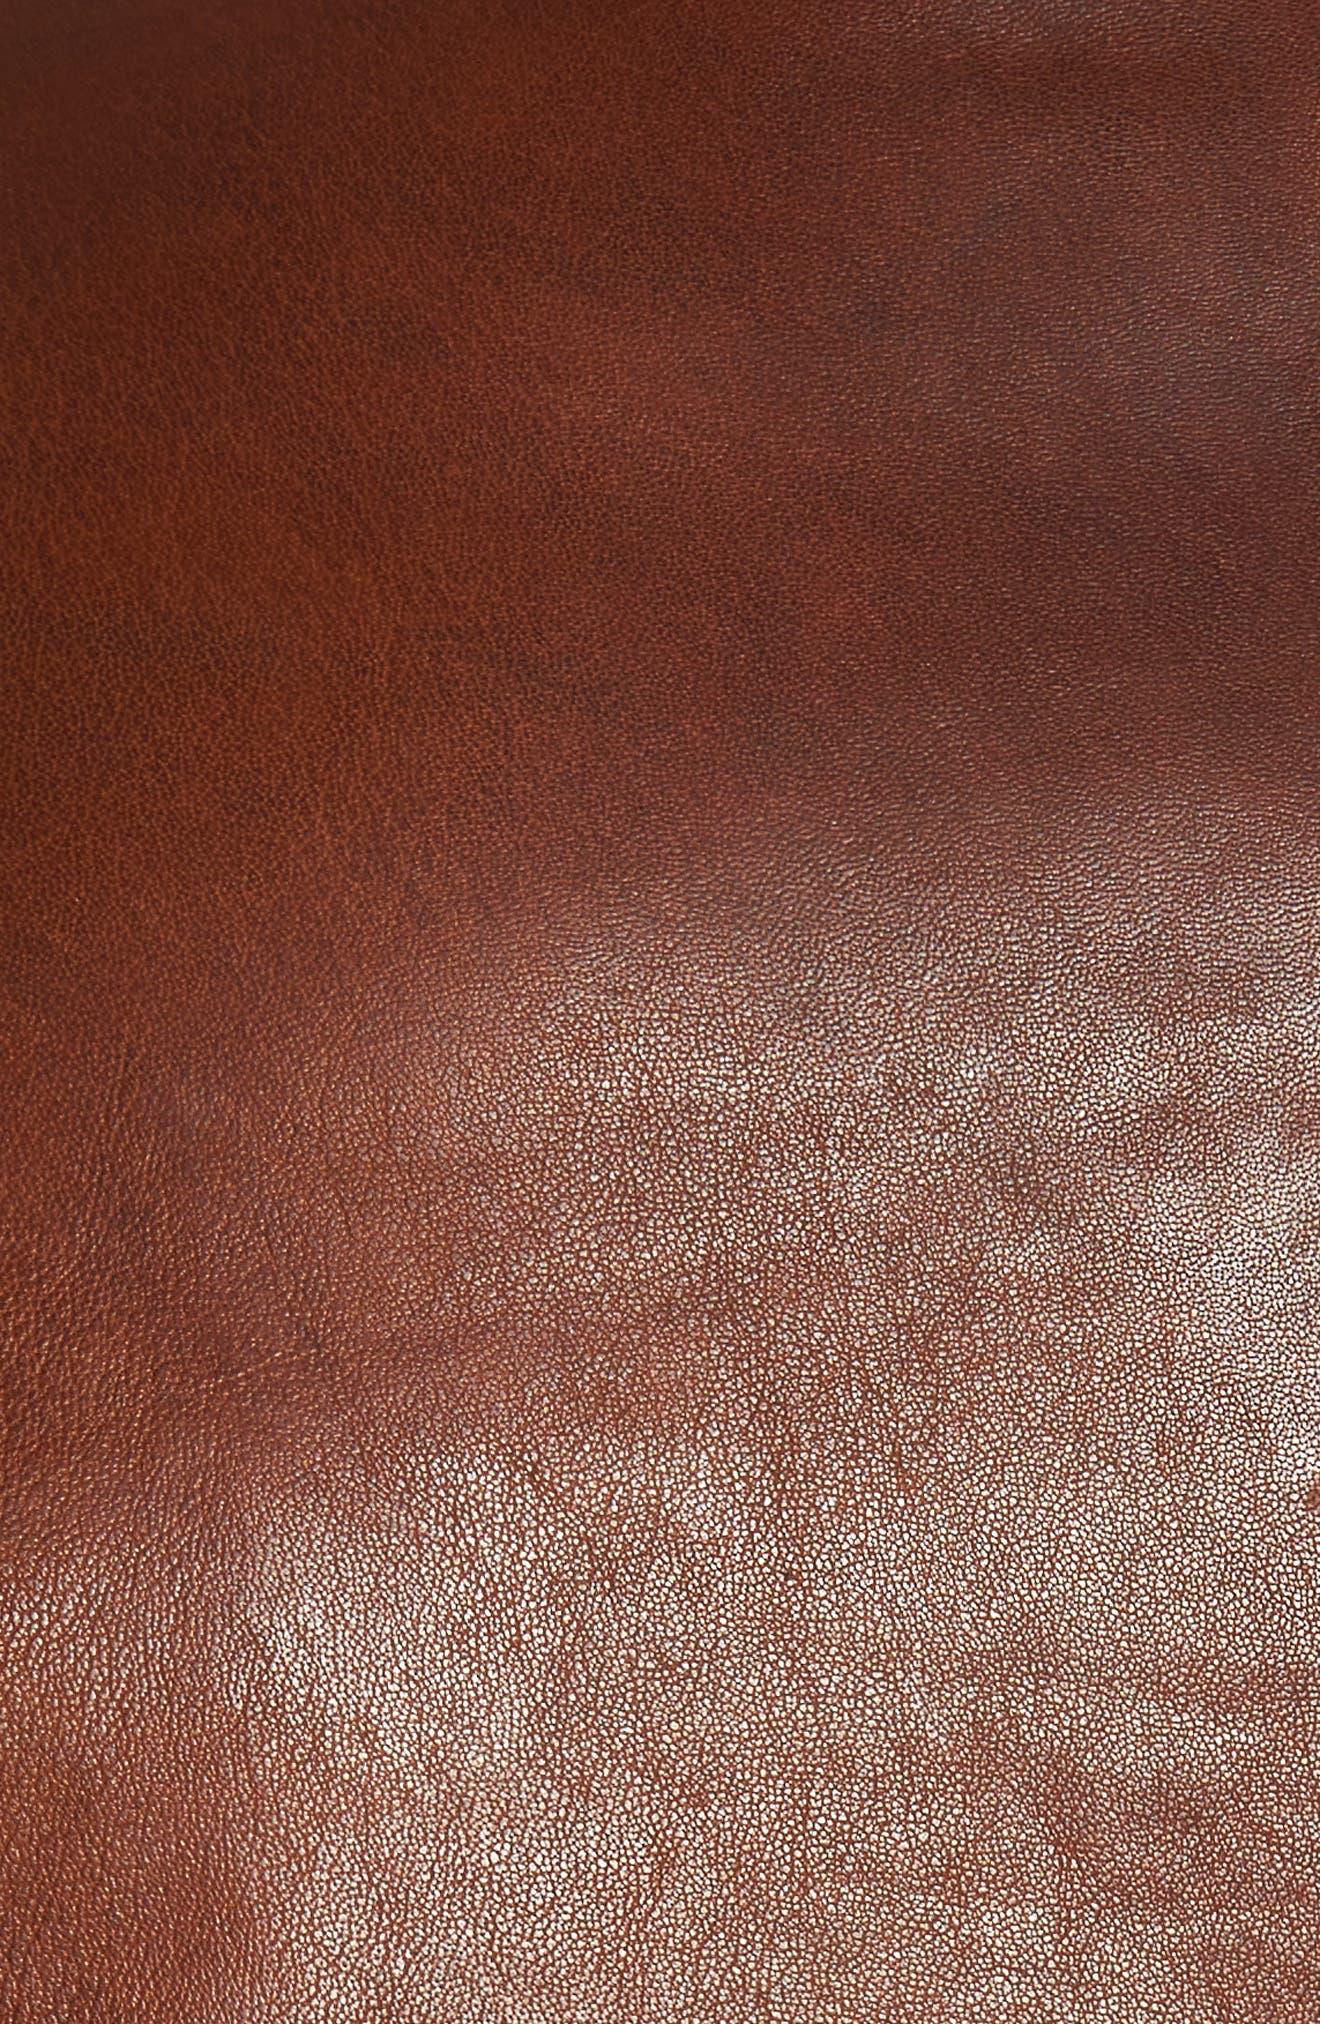 Reversible Washed Leather Jacket,                             Alternate thumbnail 5, color,                             Cognac